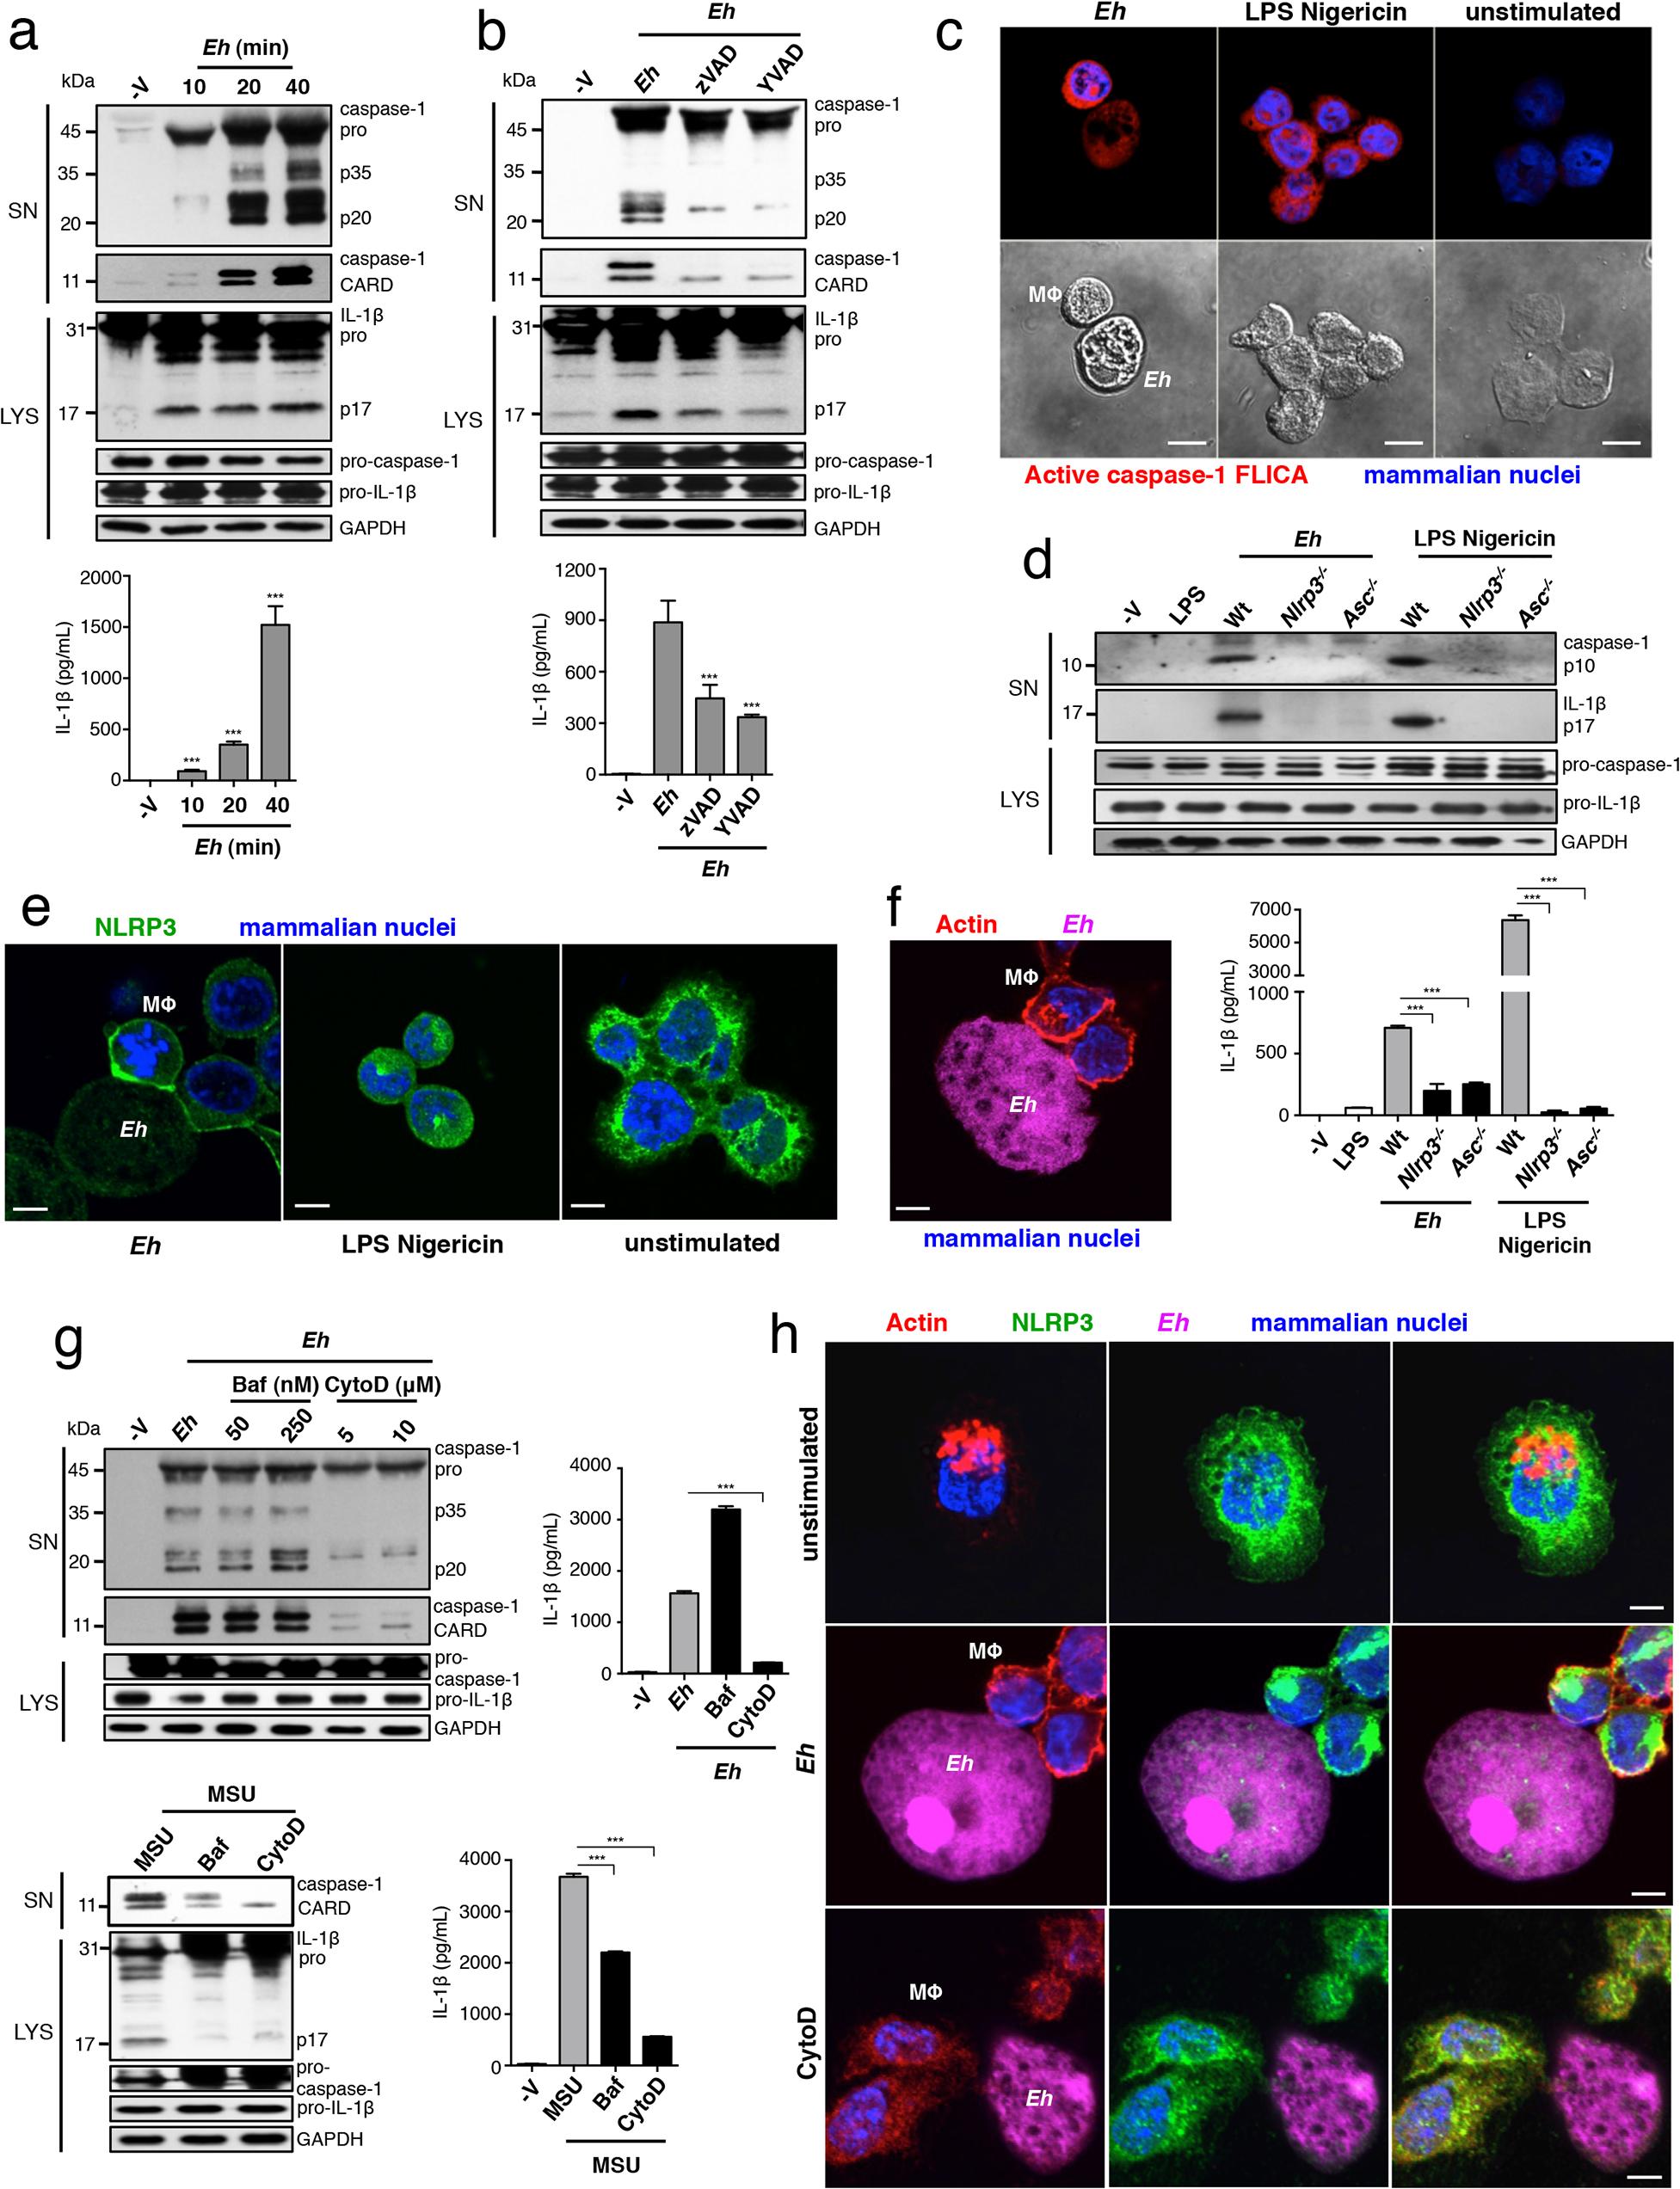 <i>E</i>. <i>histolytica</i> activates the NLRP3 inflammasome upon contact.